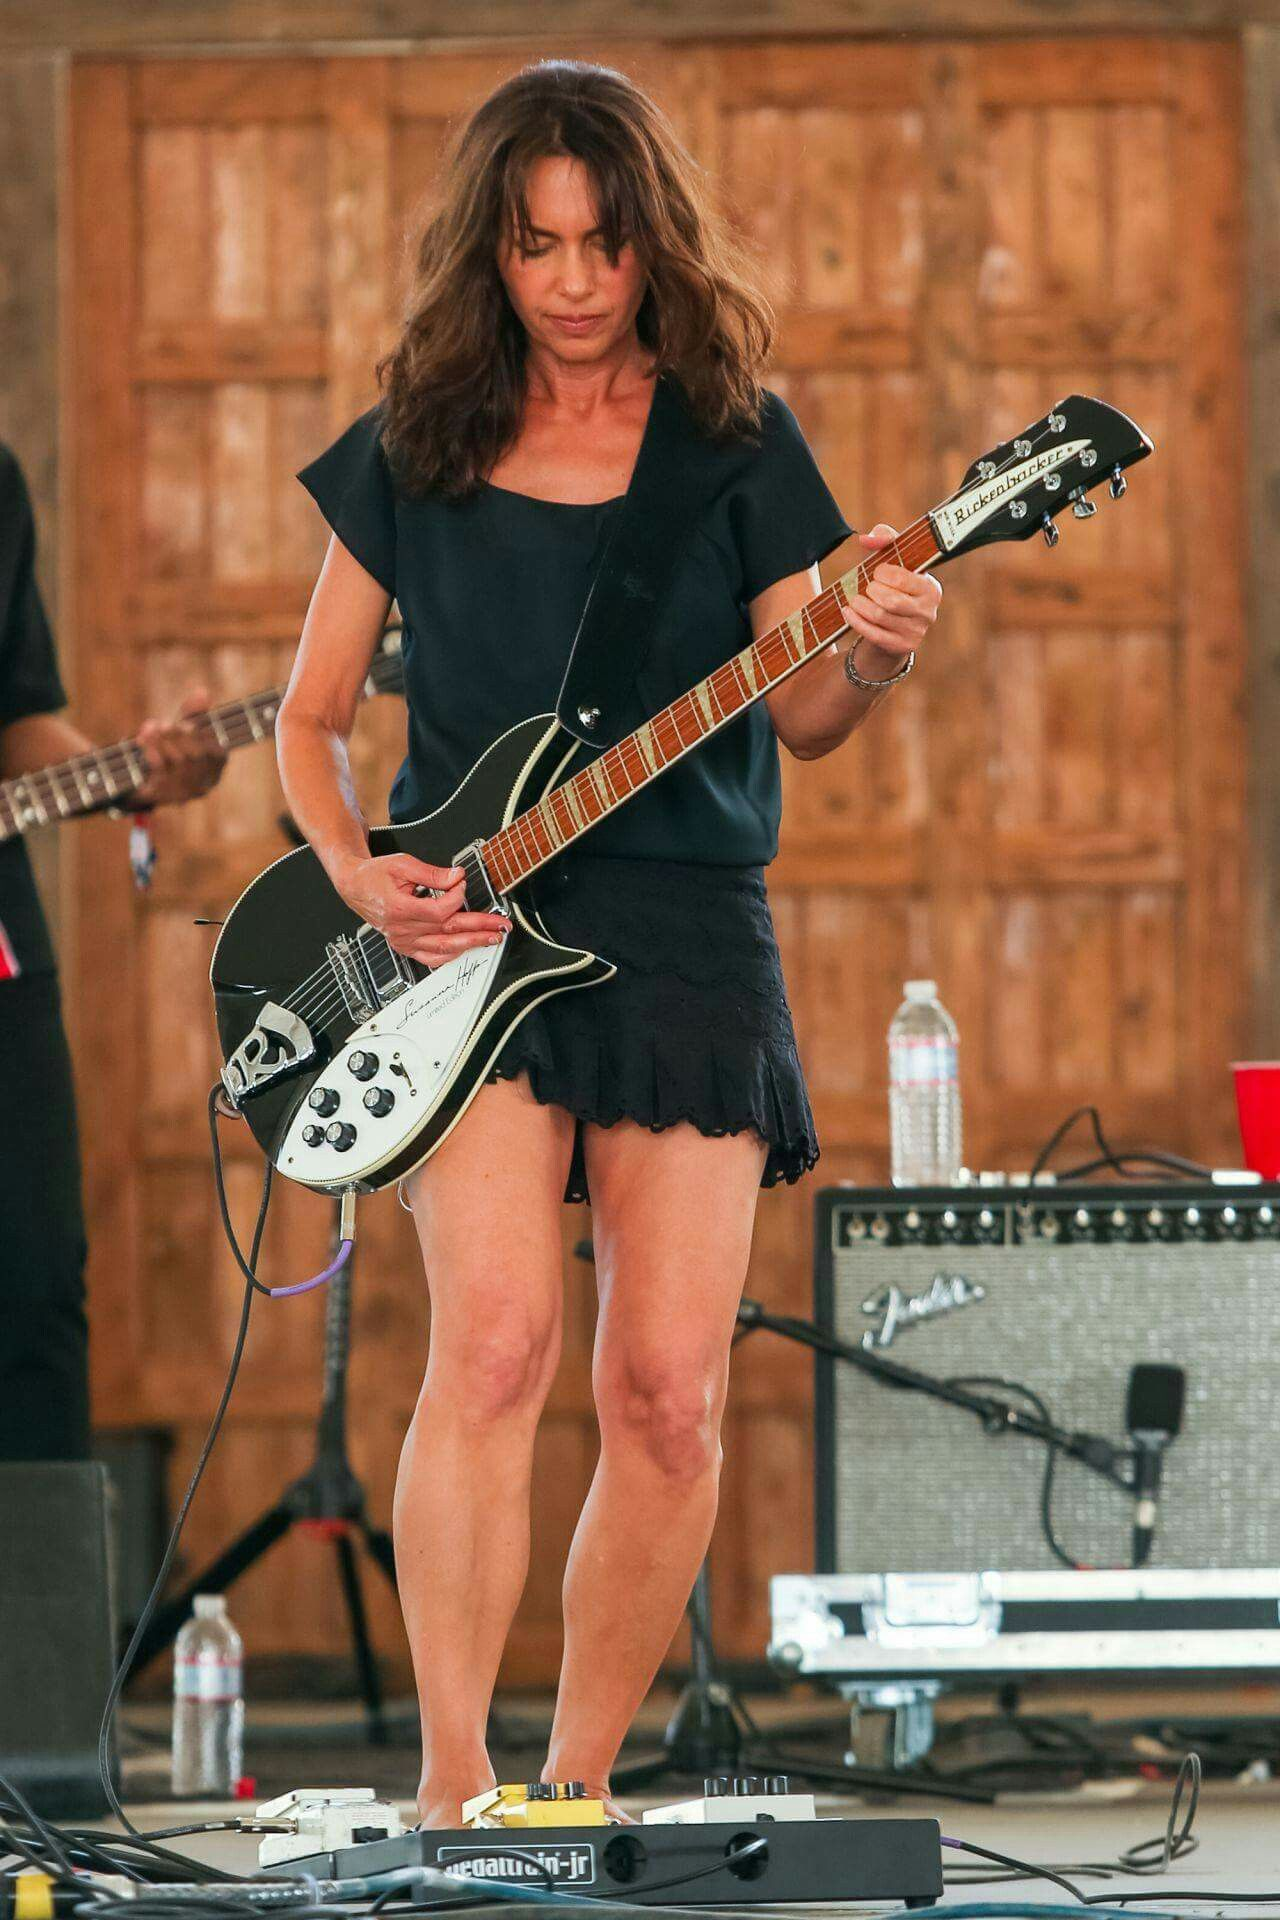 Amy Diamond,Susan Kohner Hot photos Linda Loredo,Ashlynn Yennie born May 15, 1985 (age 33)